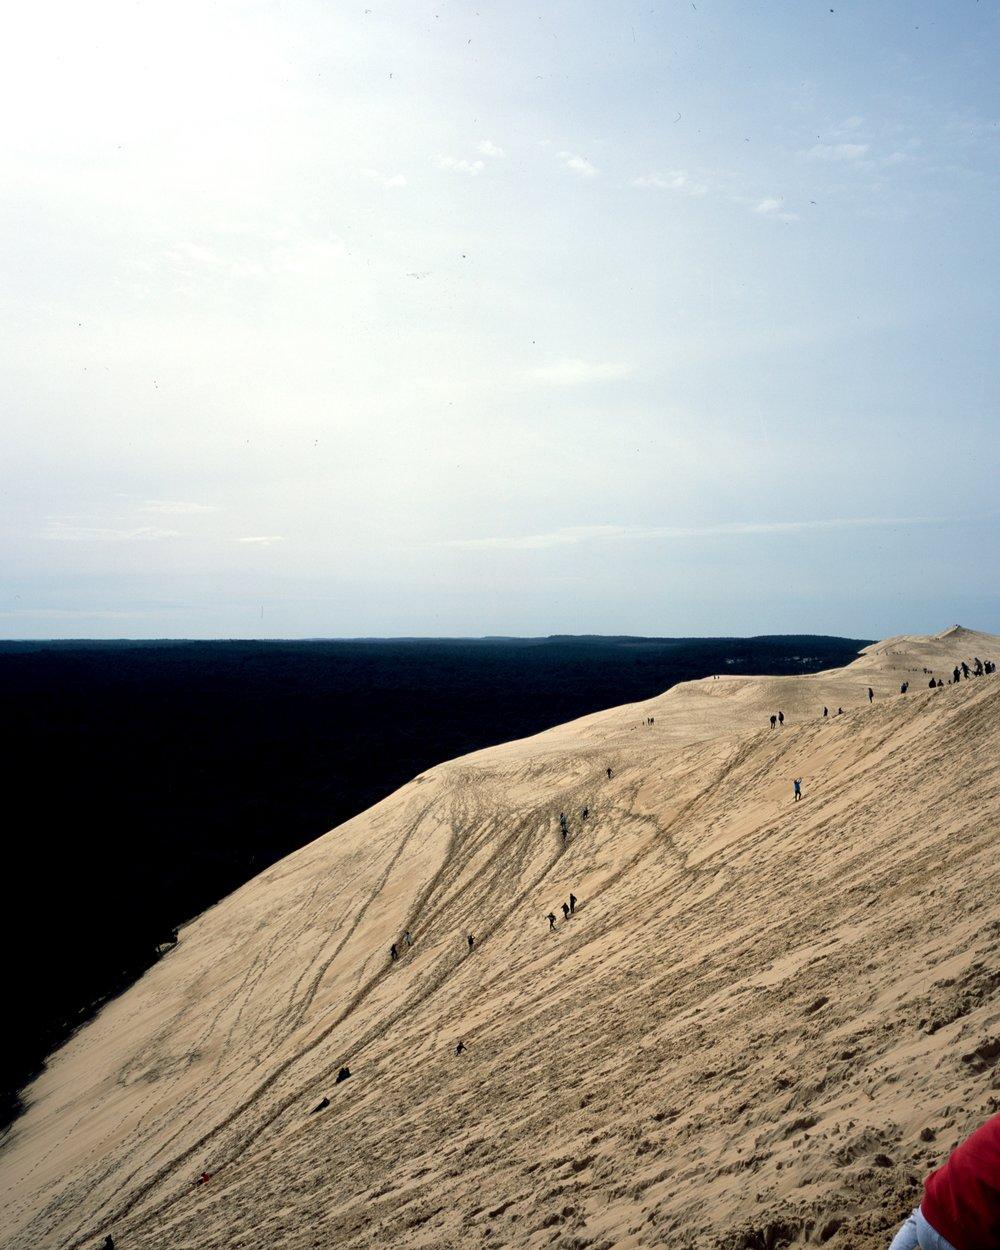 dune du pilat april18 - 002.jpeg